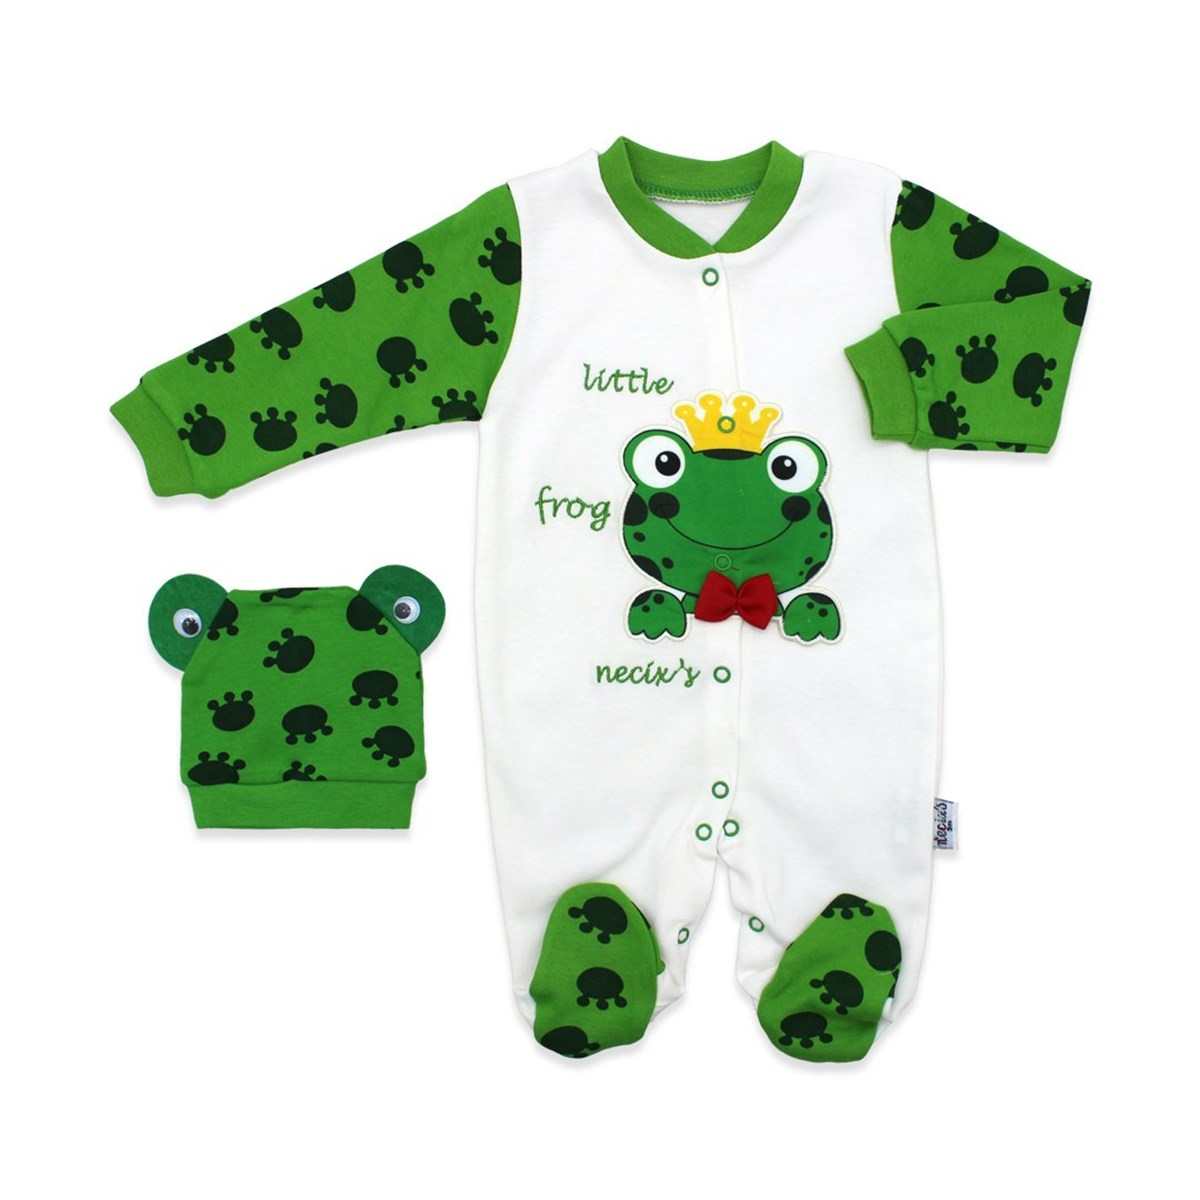 Baby's Printed Green Romper